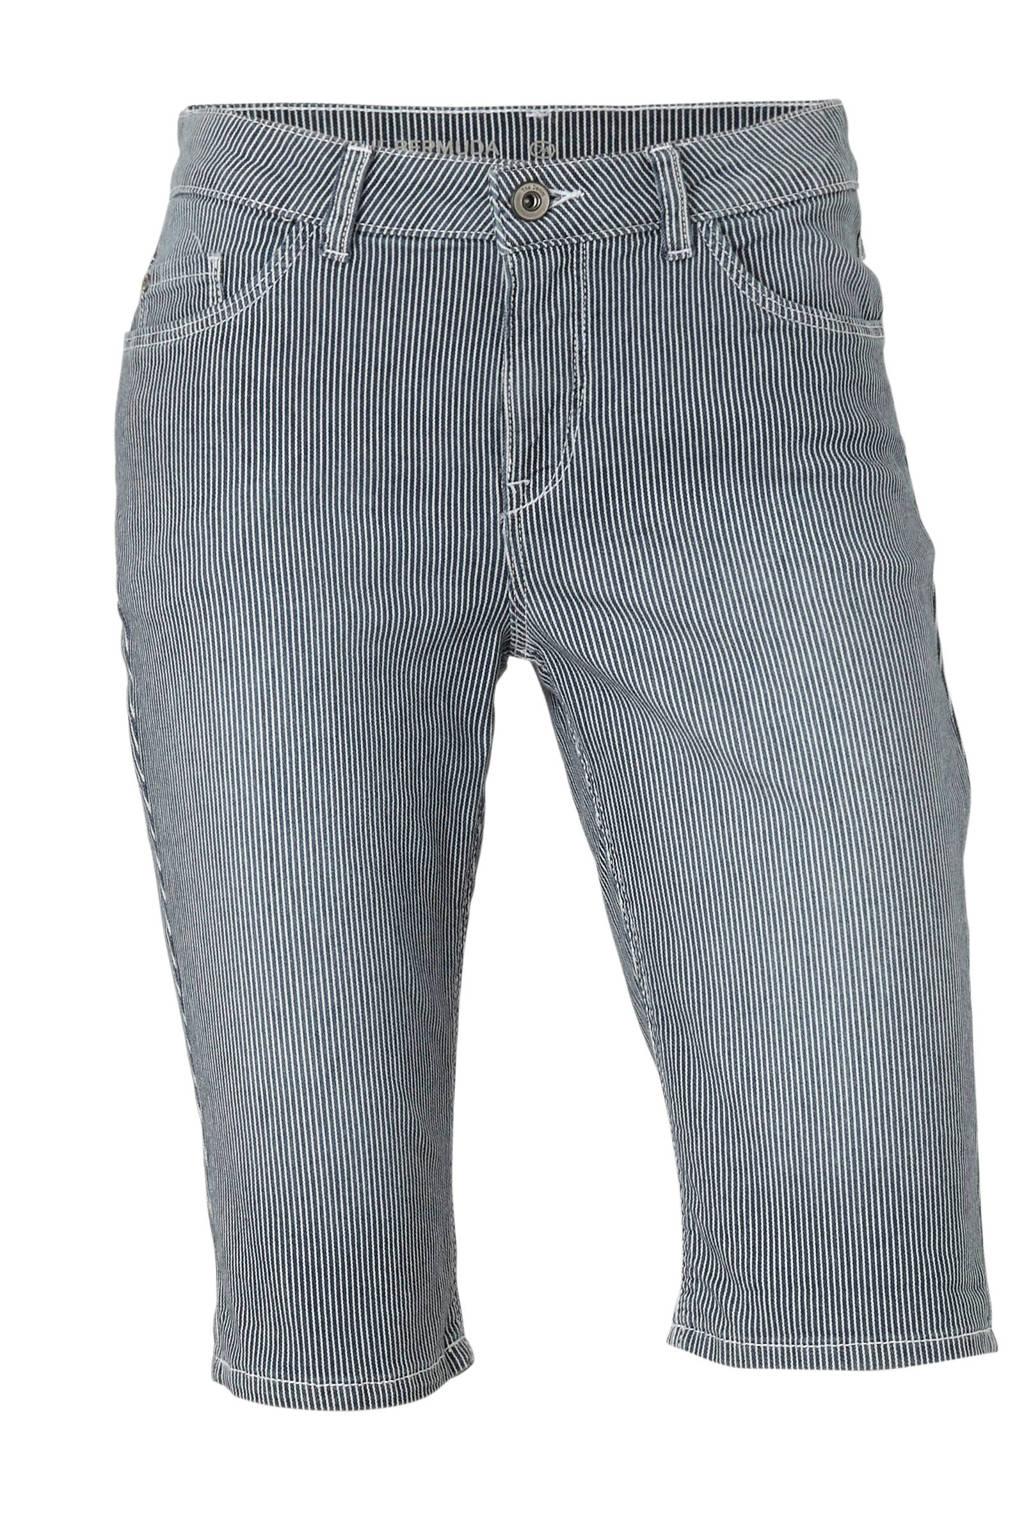 C&A The Denim gestreepte slim fit jeans short, Dark denim/wit